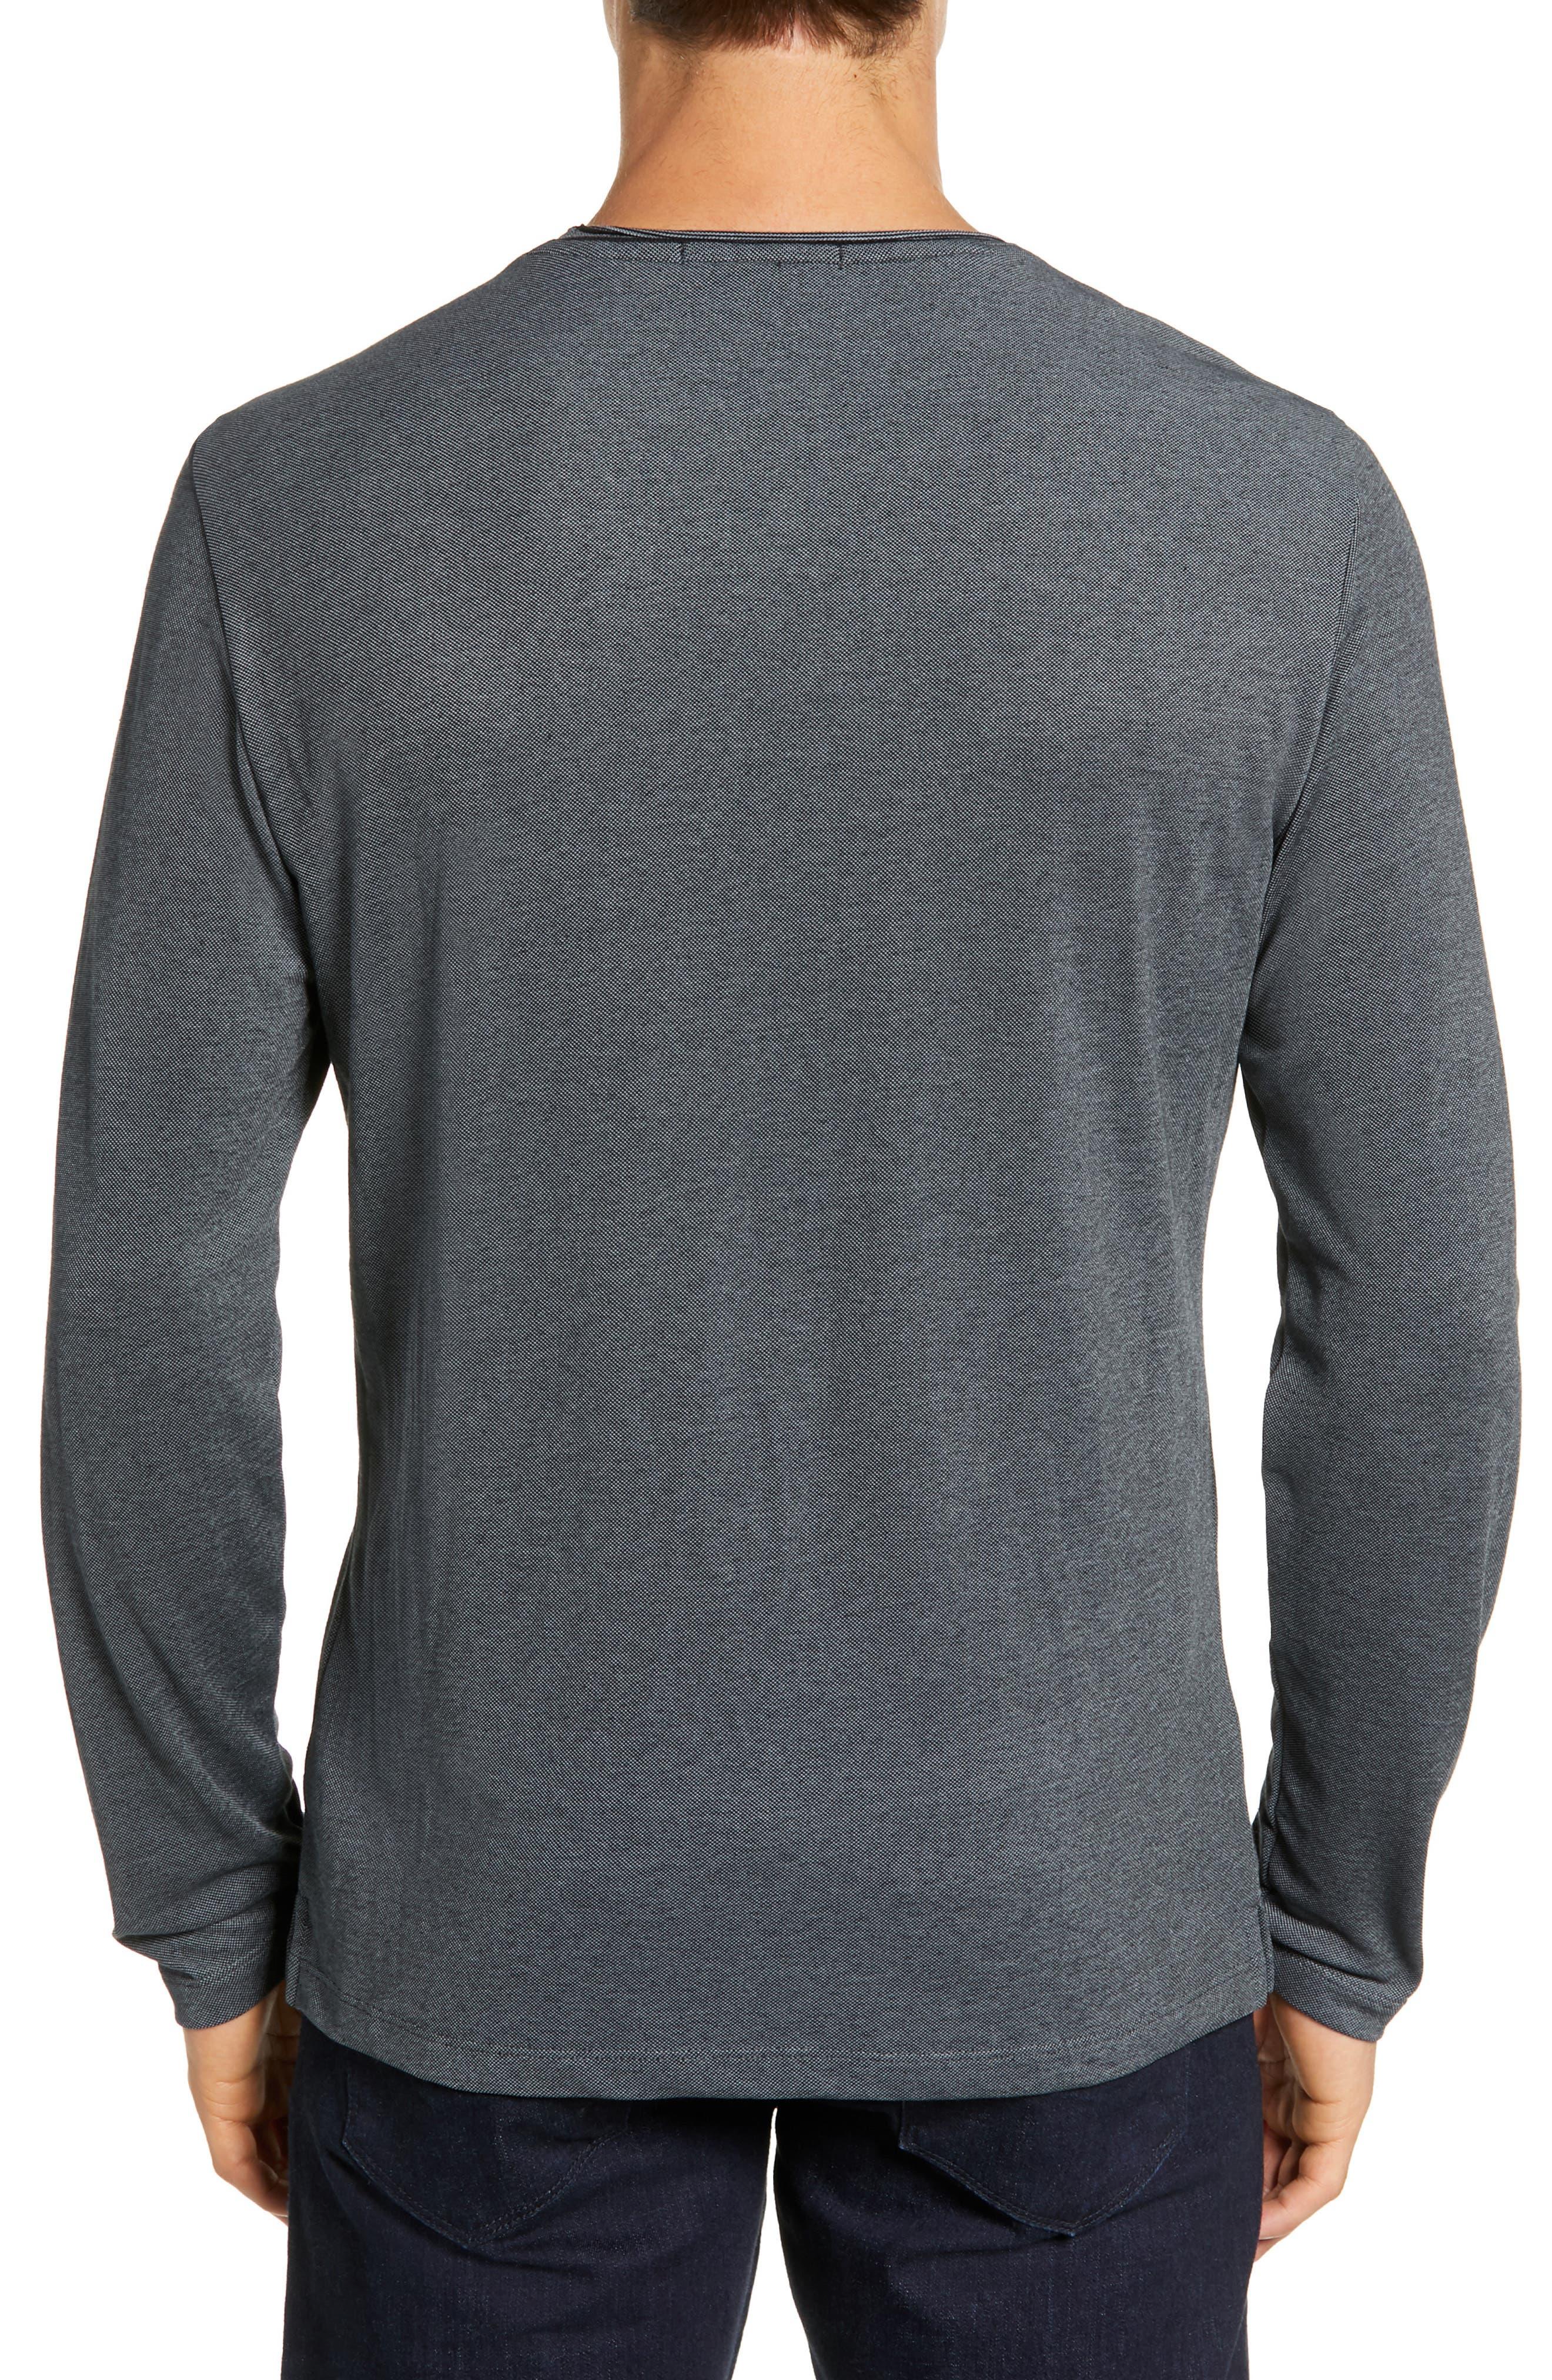 Grand Forks Long Sleeve Piqué T-Shirt,                             Alternate thumbnail 2, color,                             GREY